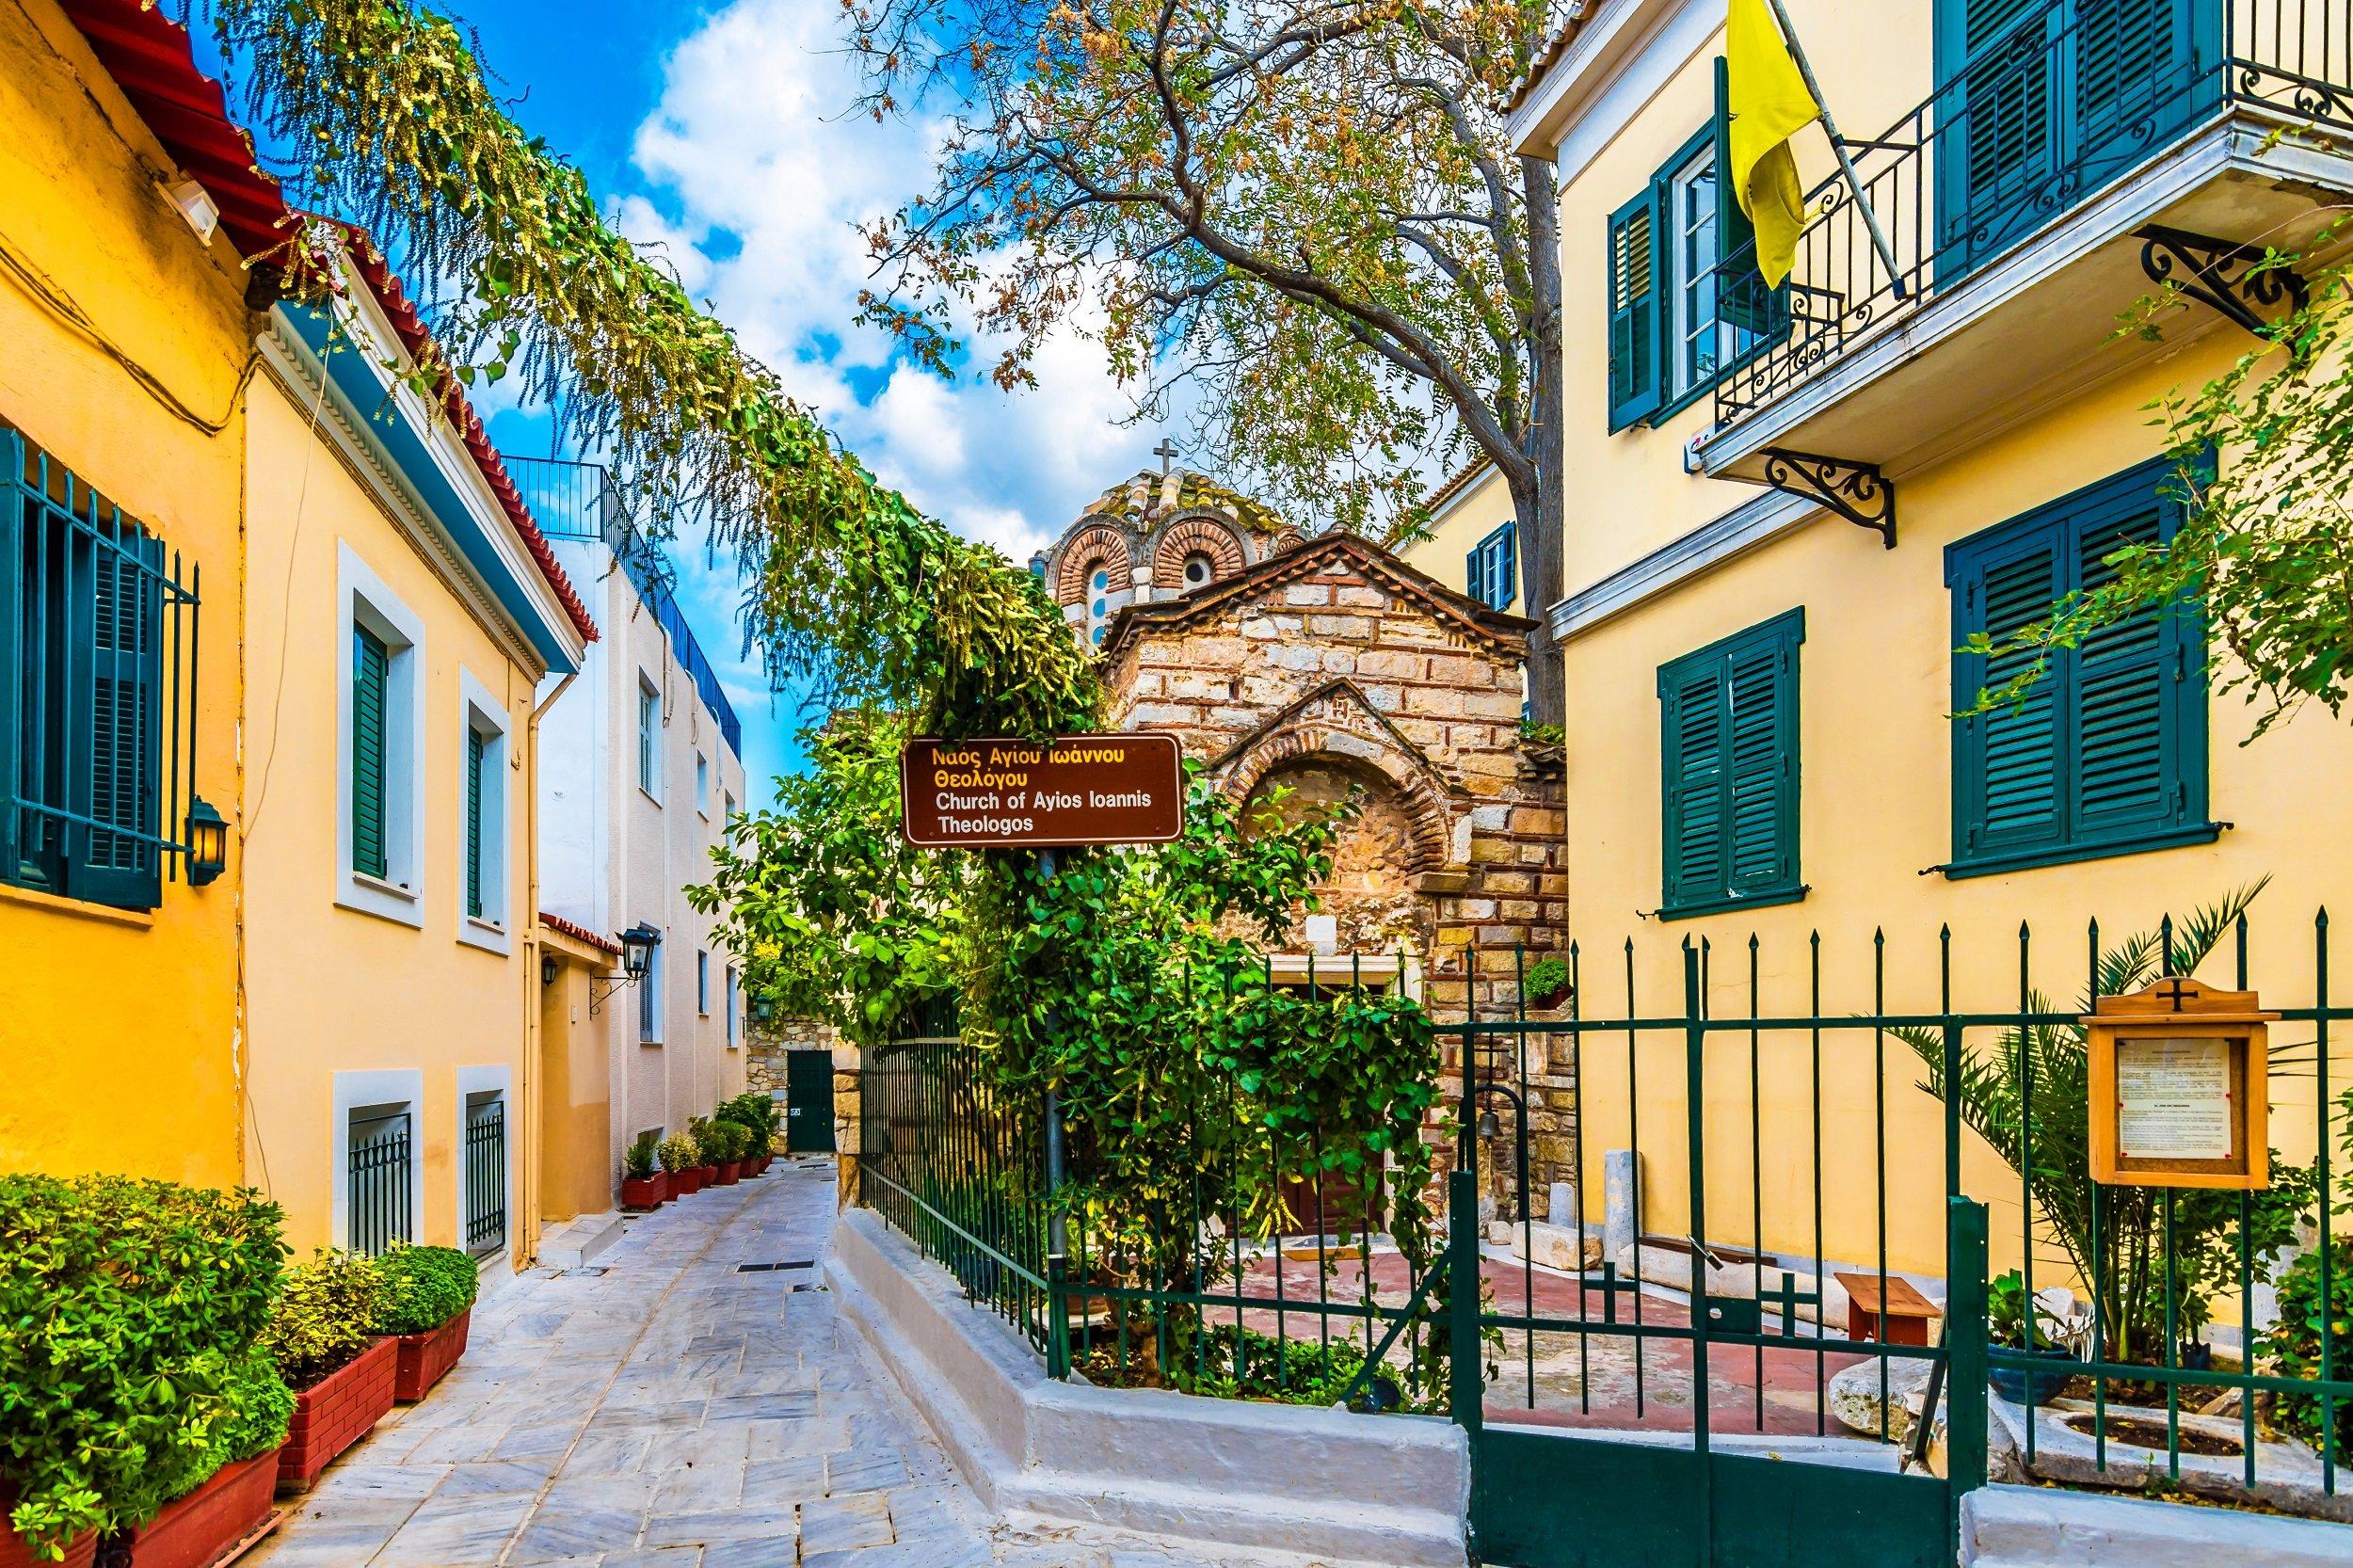 Plaka- Athens 5 Day City Break Tour Package